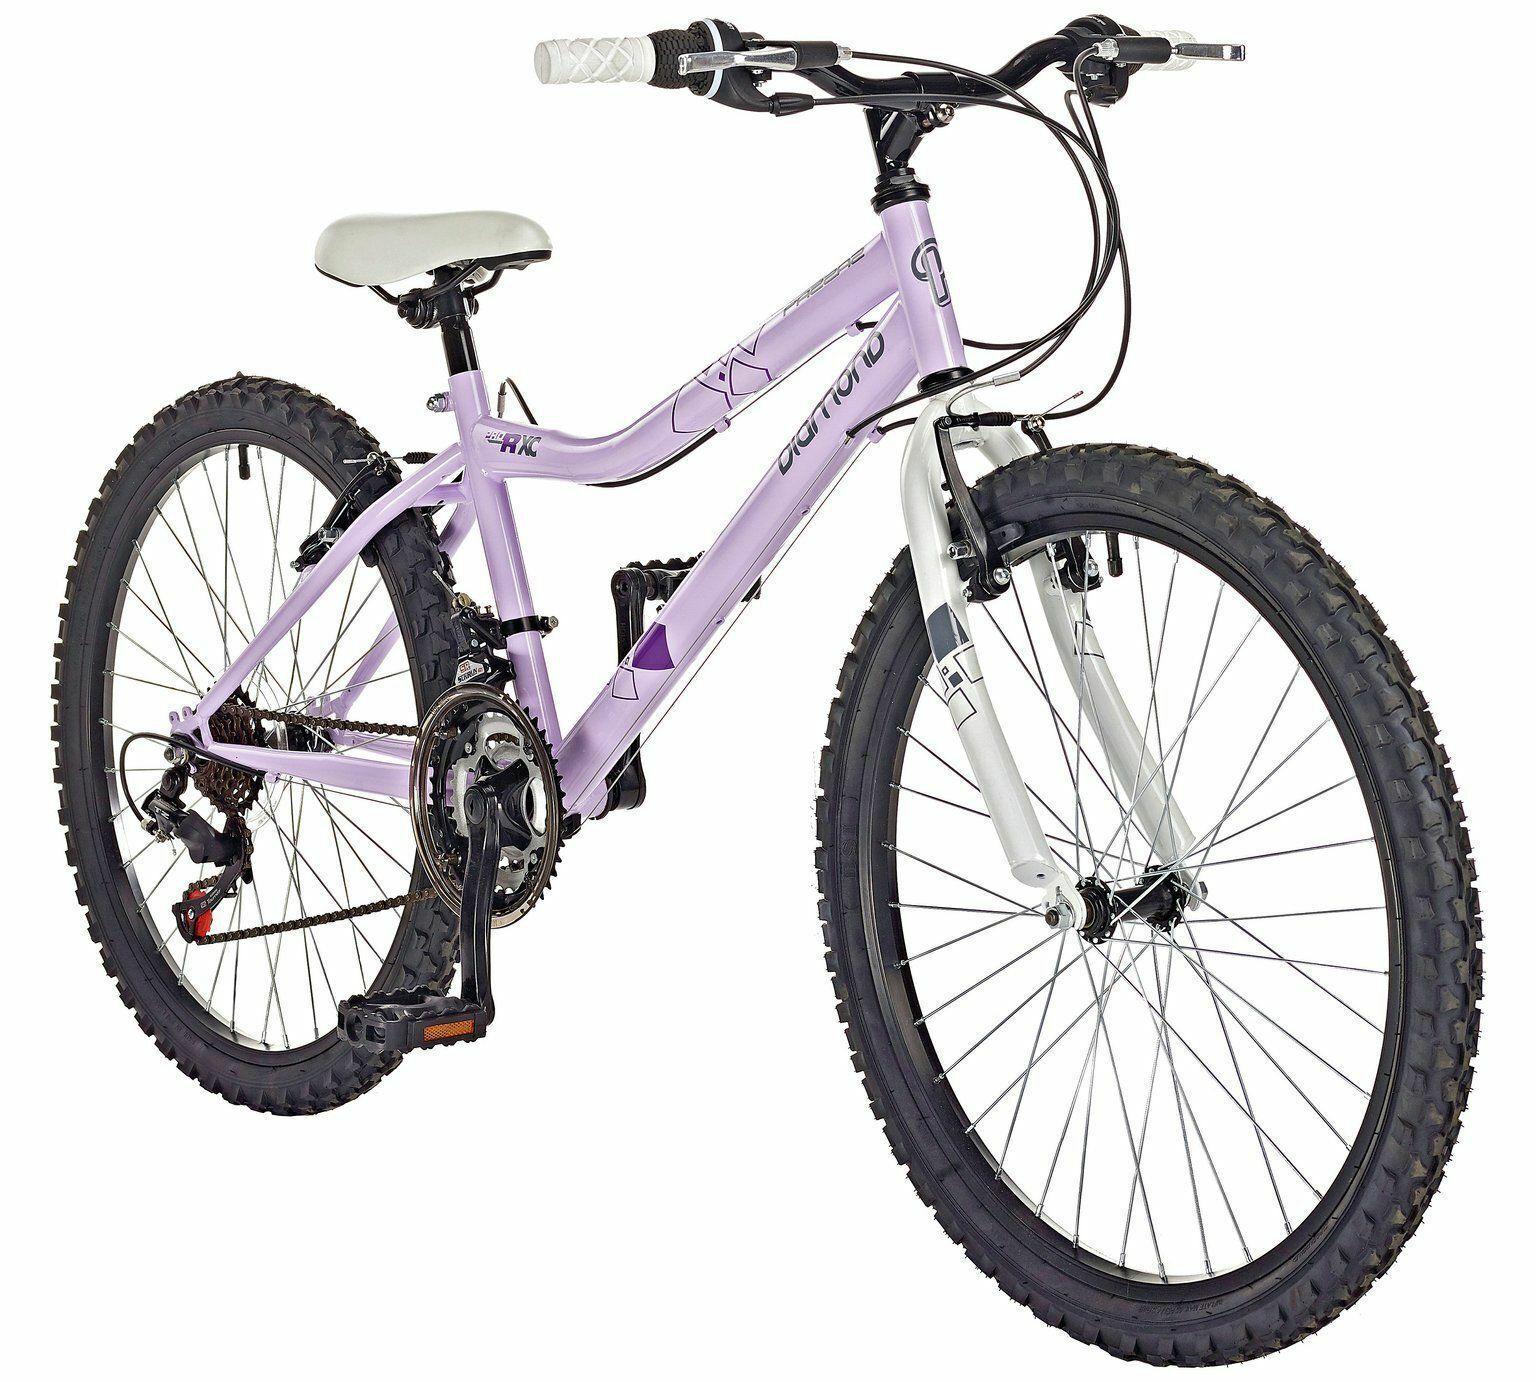 "Pazzaz Diamond 24"" Inch Wheel Kids Childrens Childs Rigid Bike Purple Bicycle"